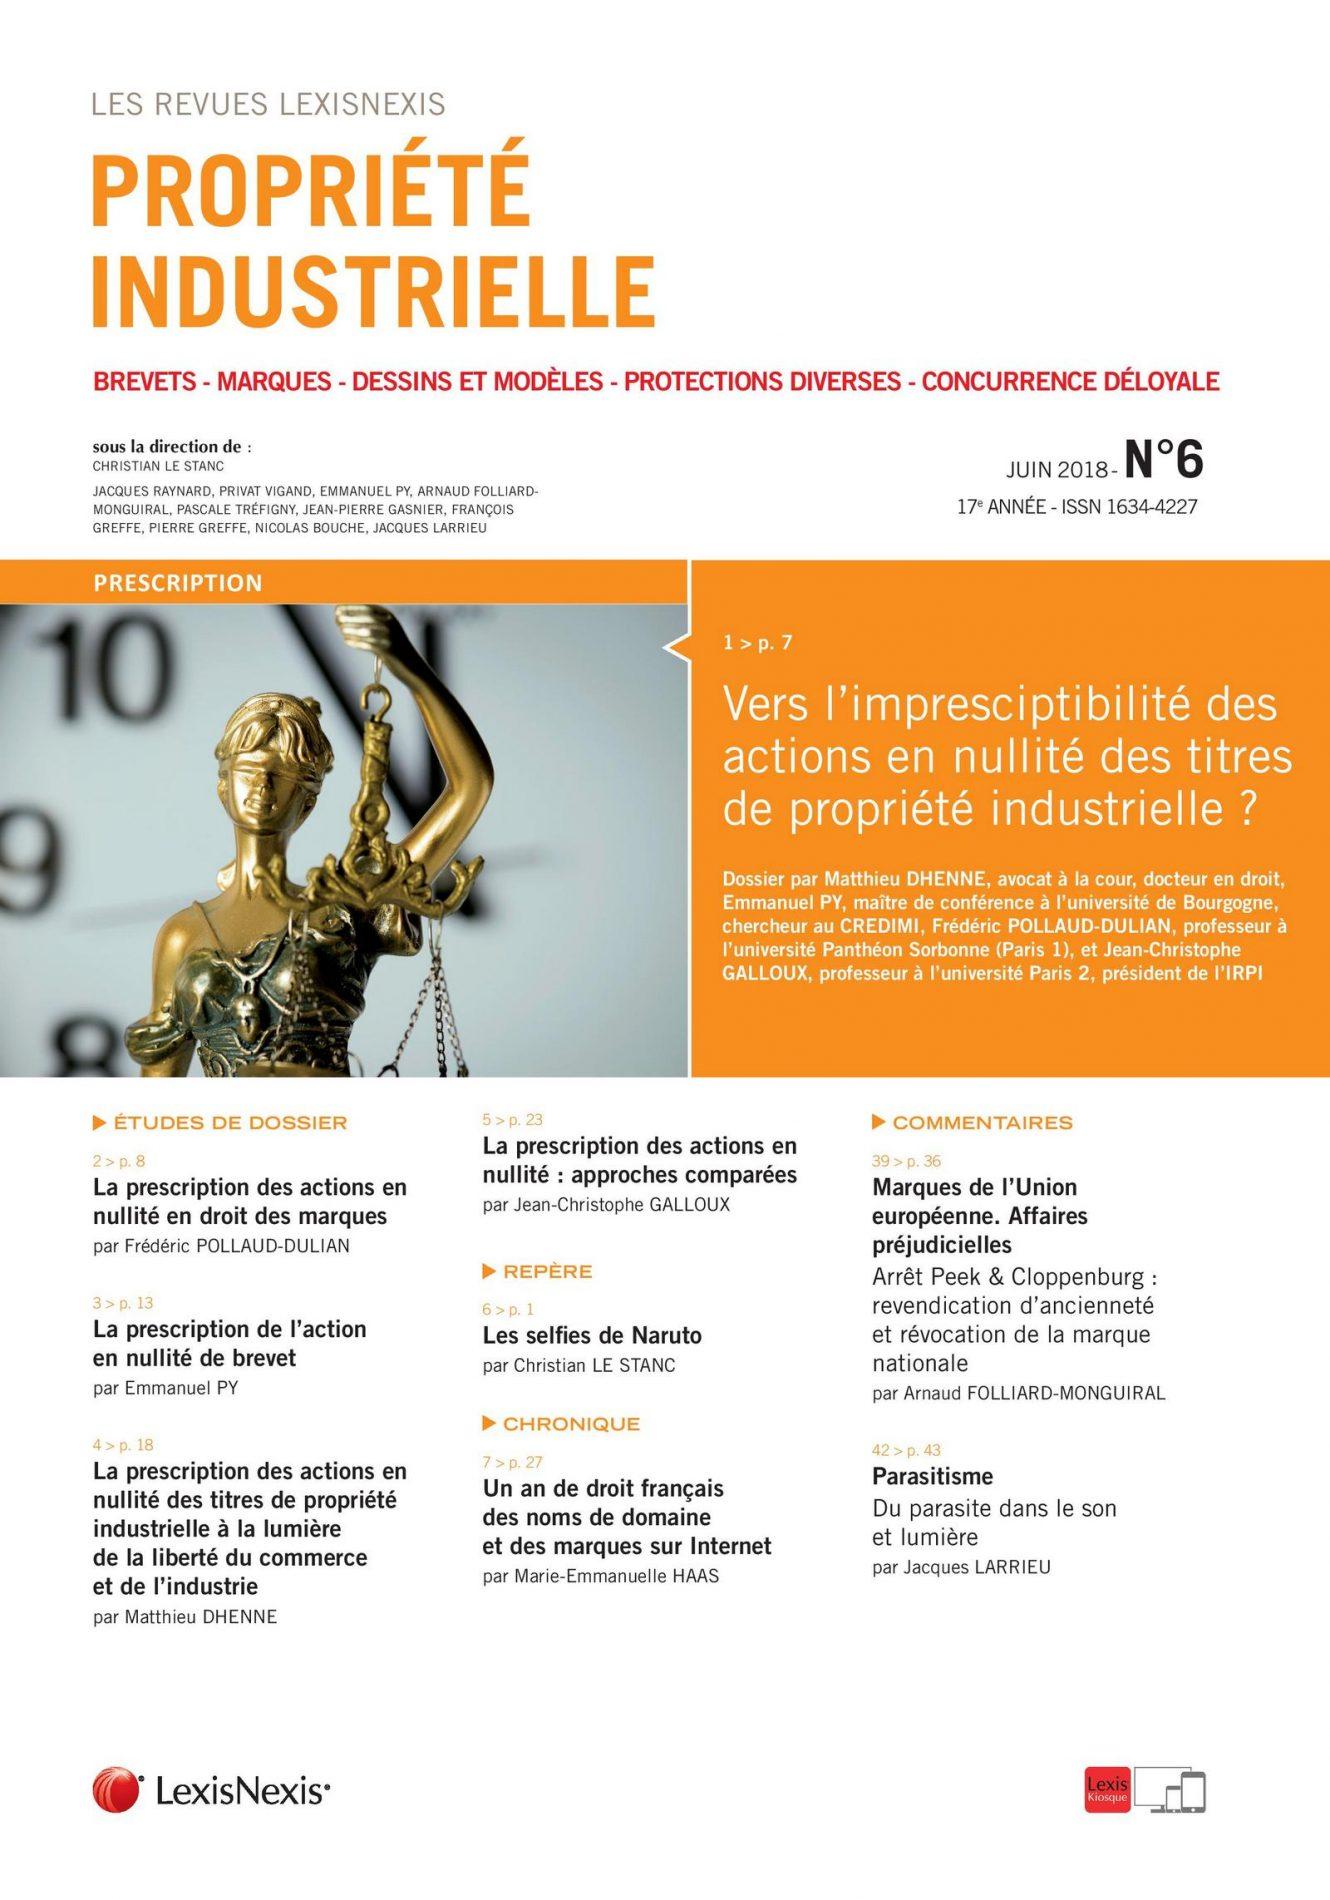 http://www.institutboufflers.org/wp-content/uploads/2018/06/B-publications.jpg